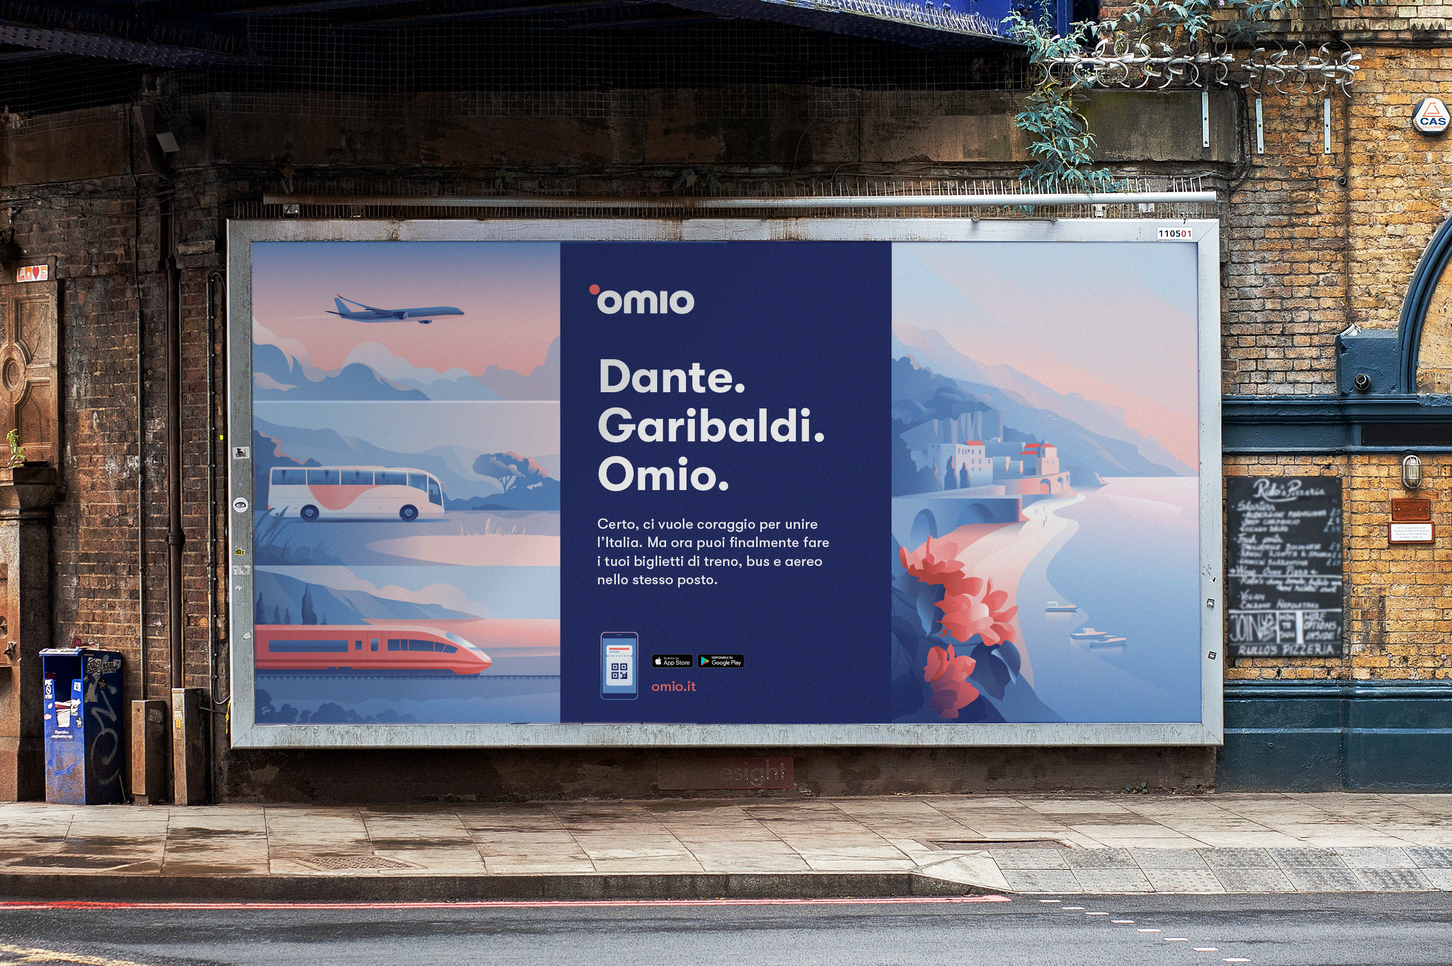 omio-billboard_crop.png